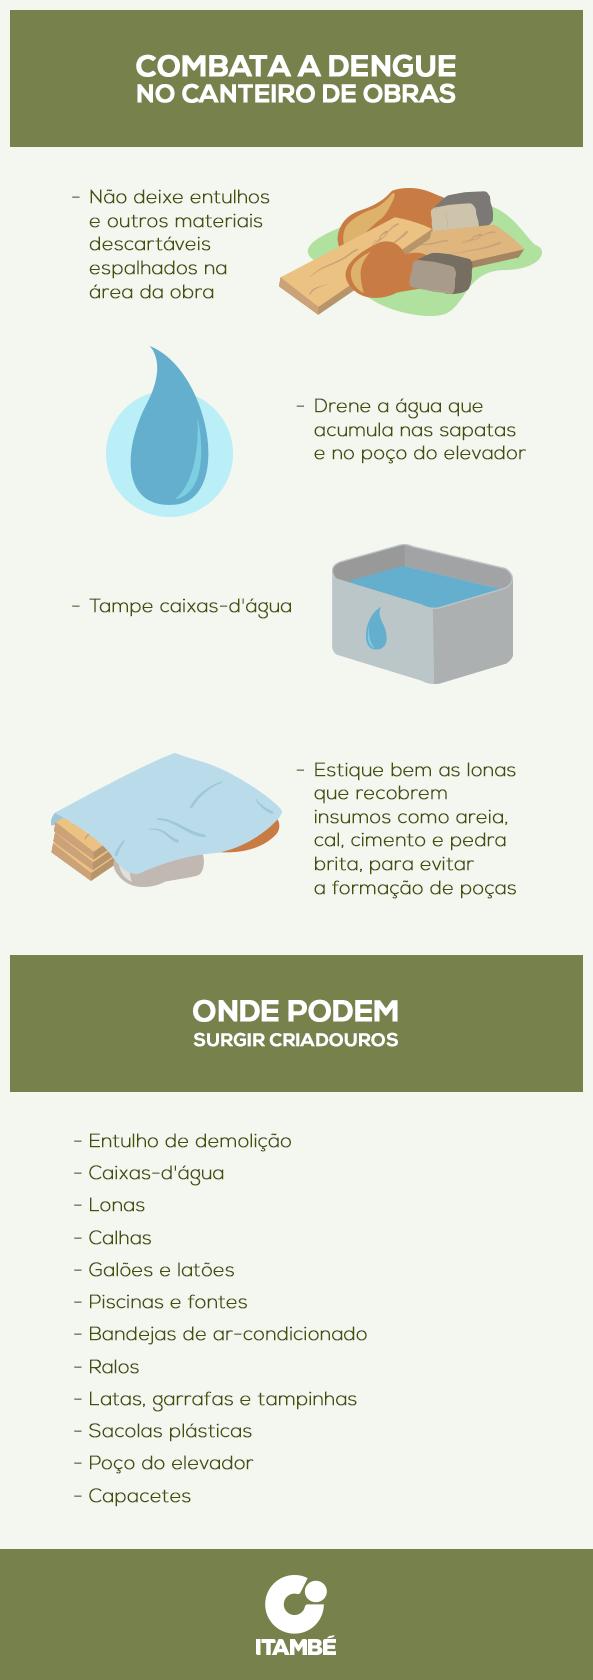 Info_ObraDengue